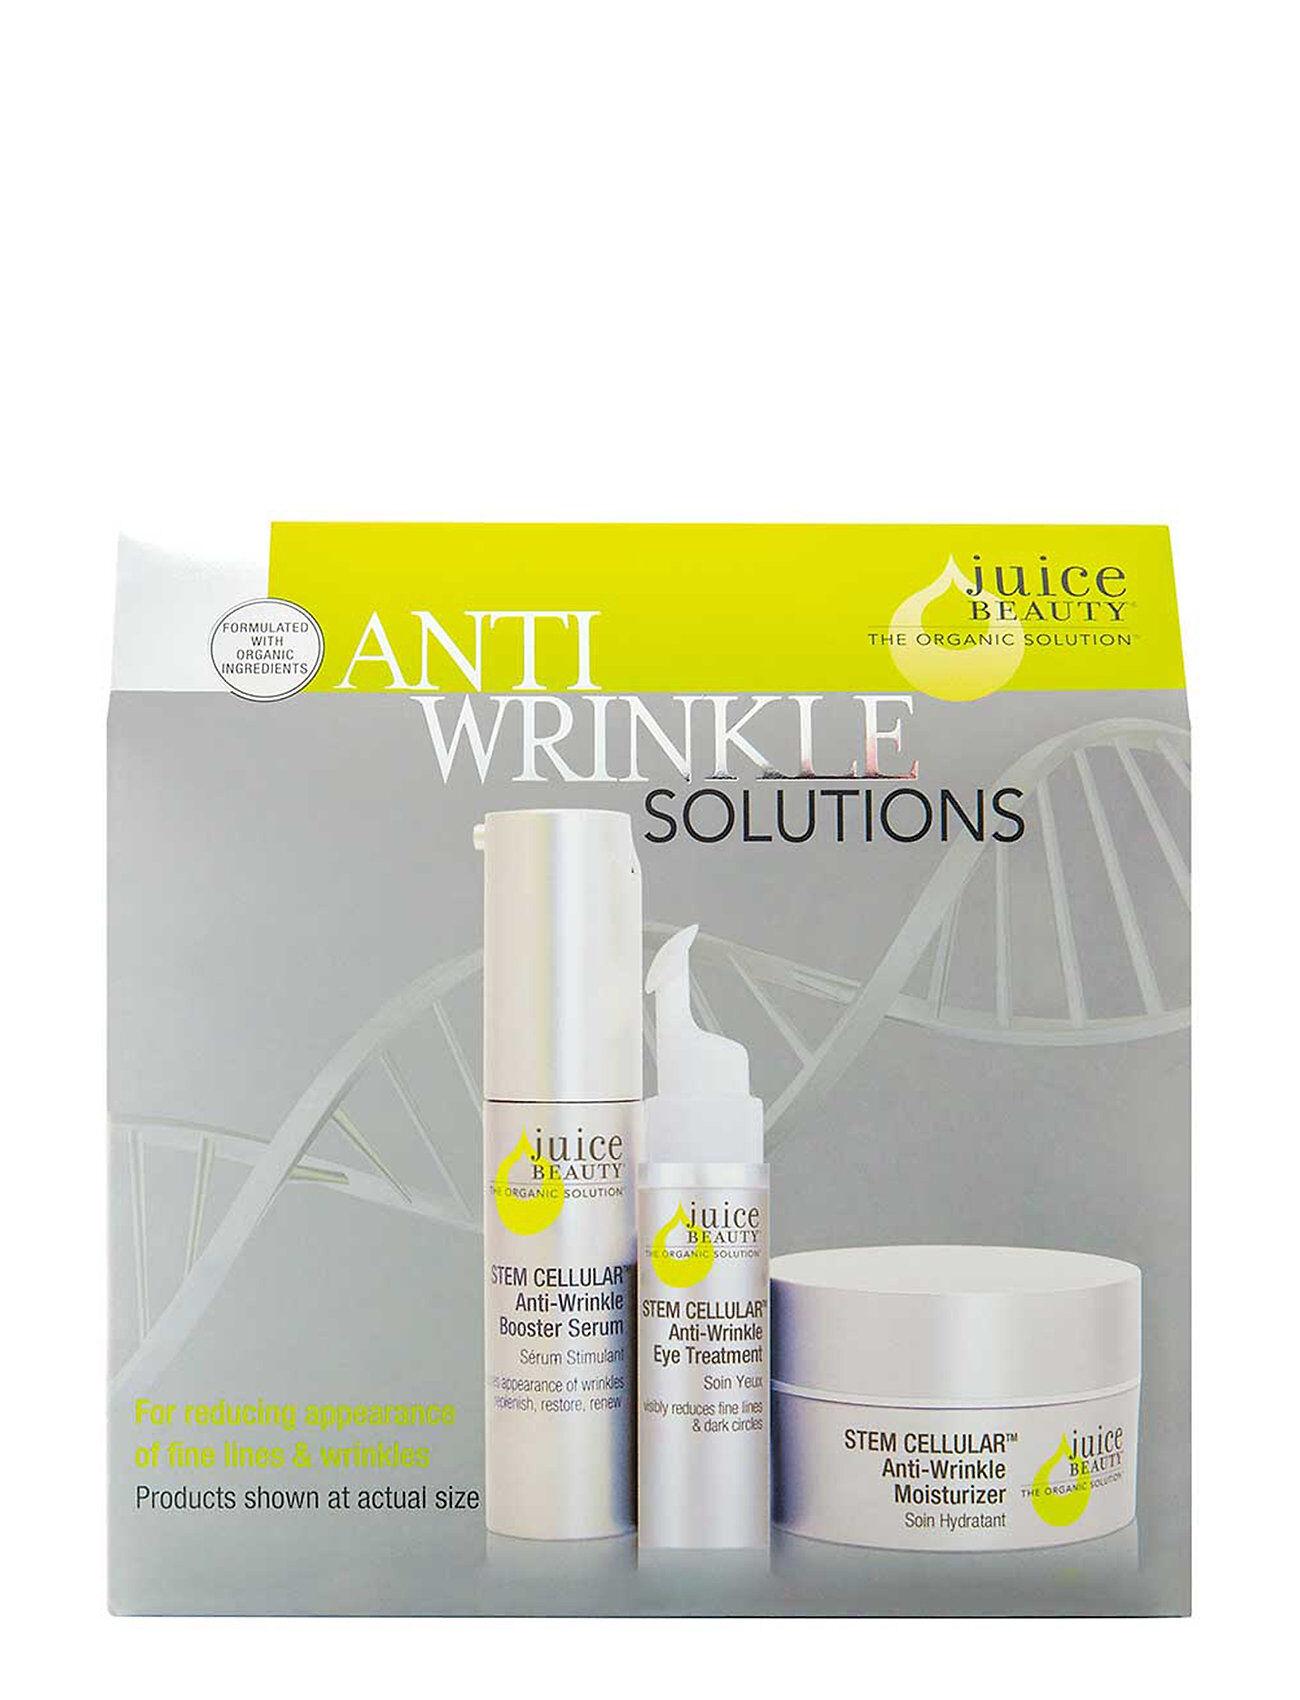 Juice Beauty Stem Cellular™ Anti-Wrinkle Solutions Kit